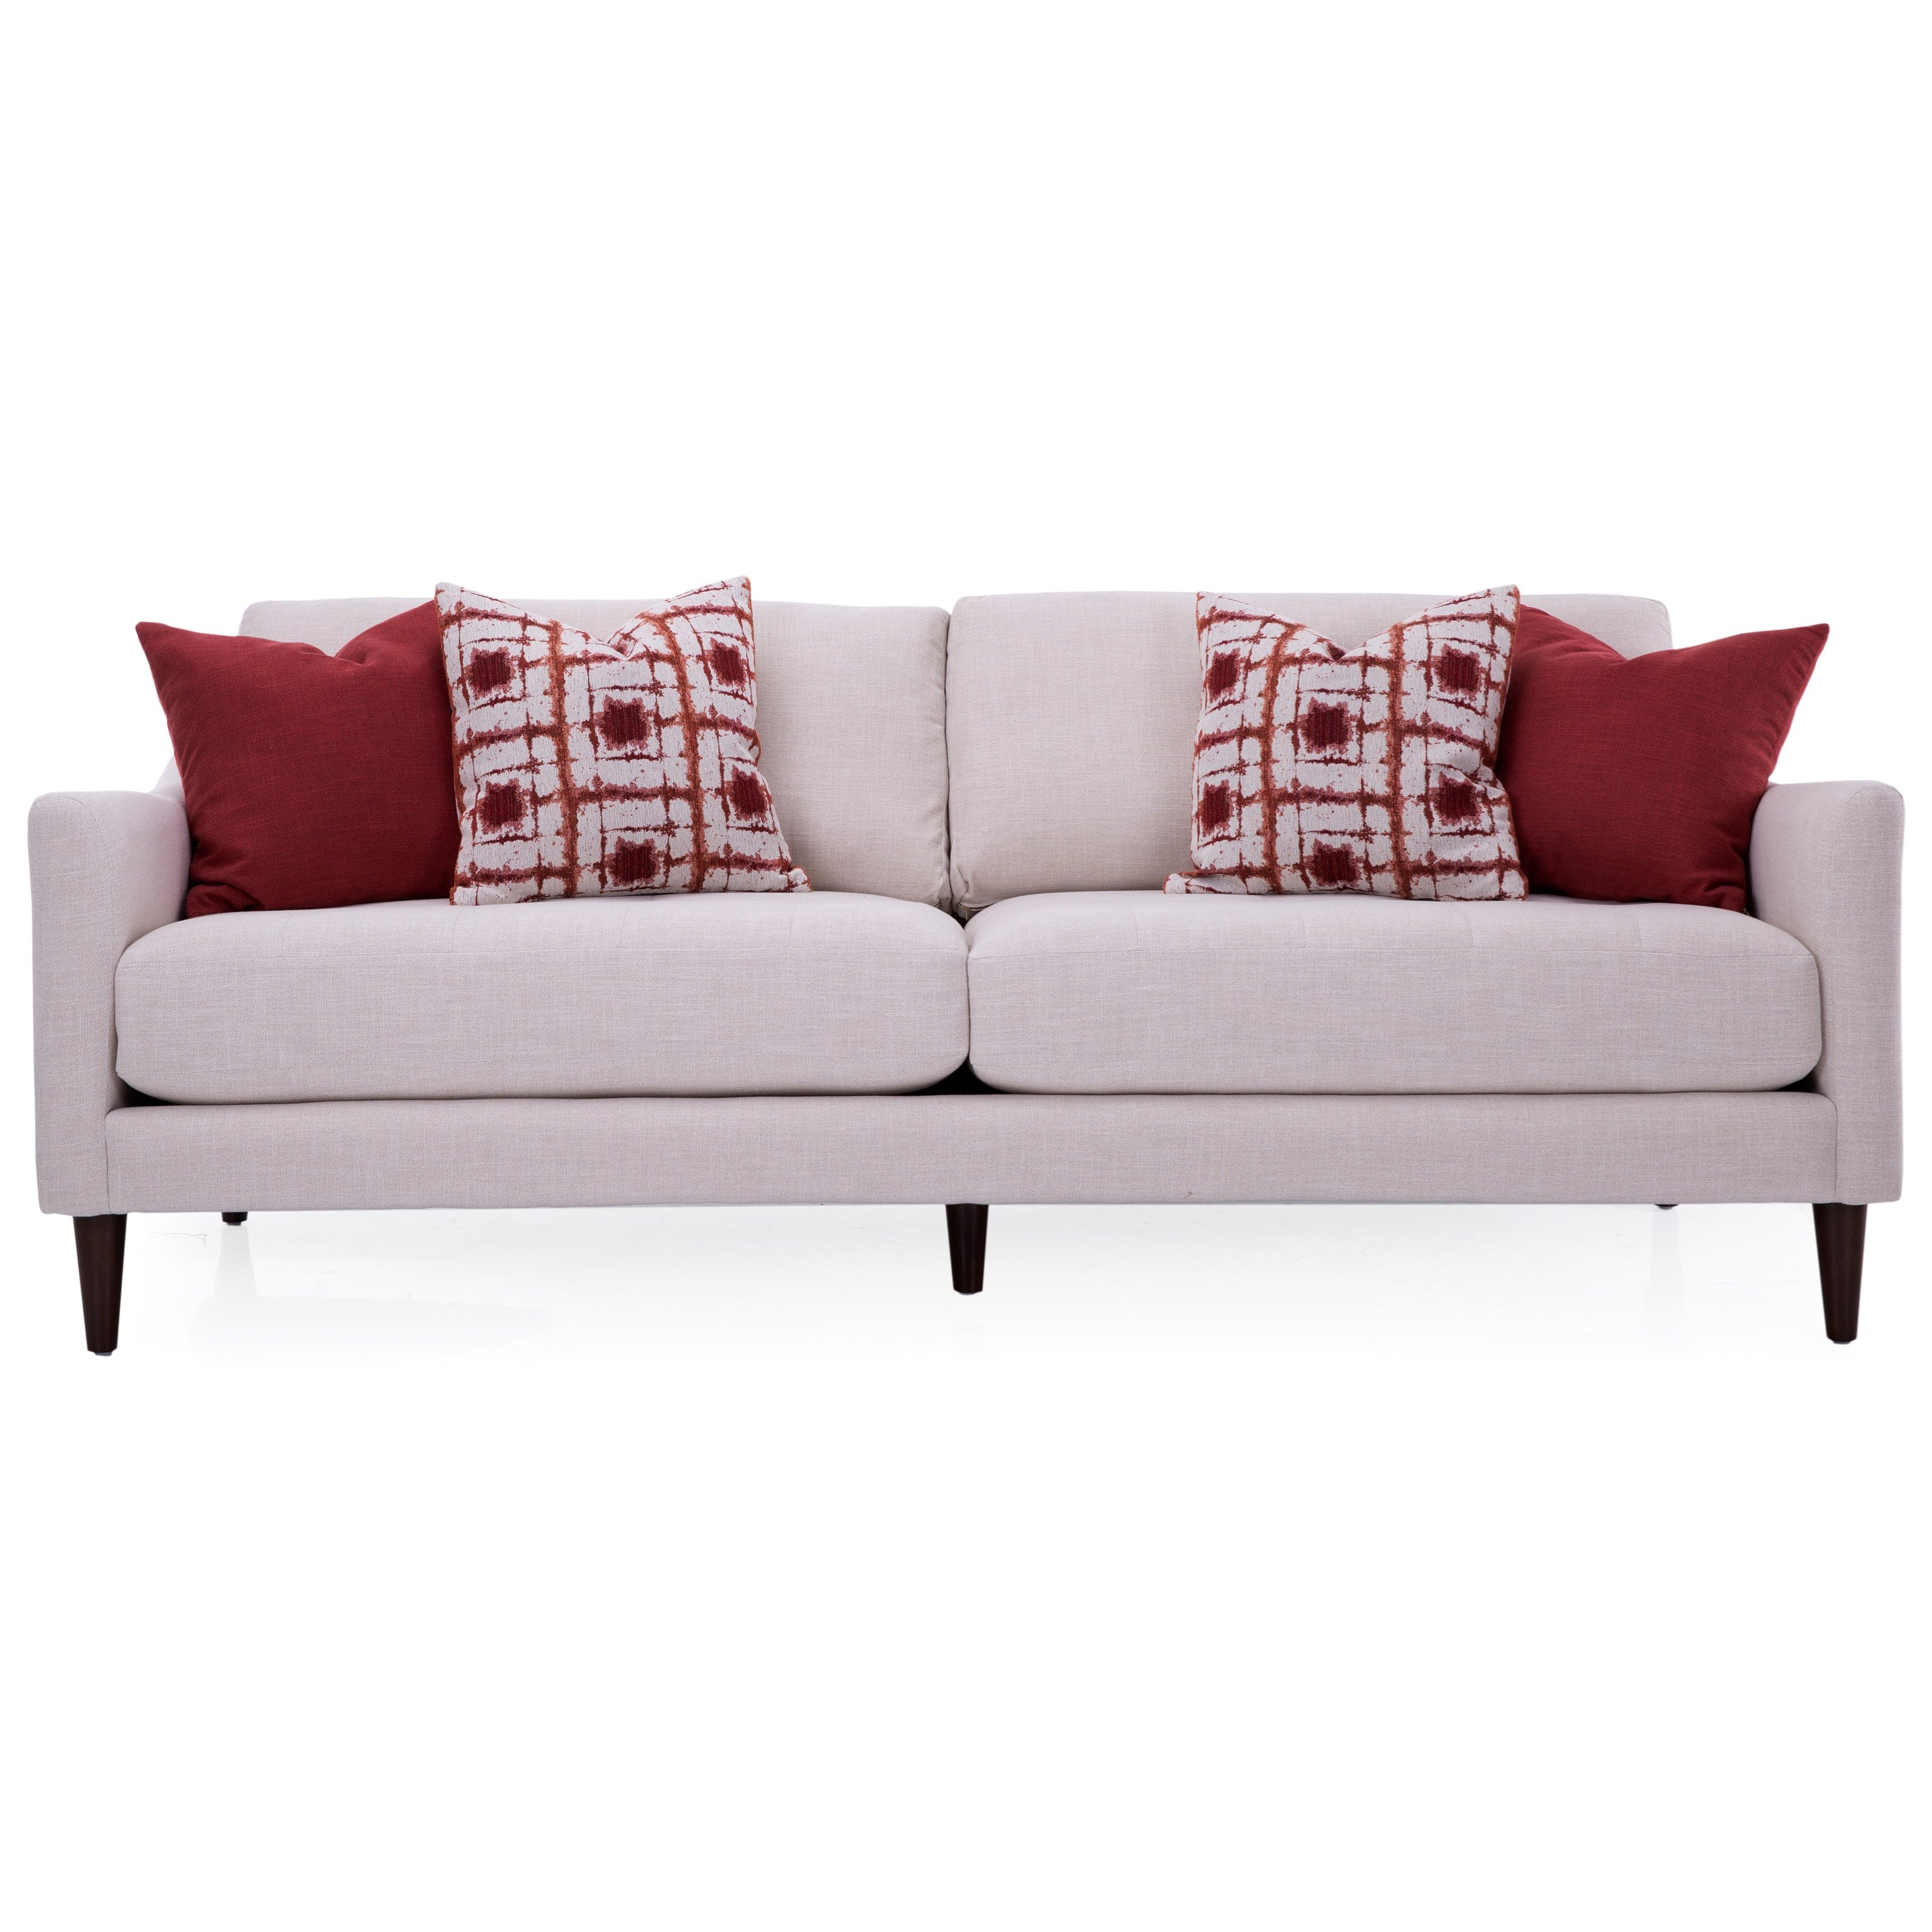 2M1 Sofa by Decor-Rest at Johnny Janosik